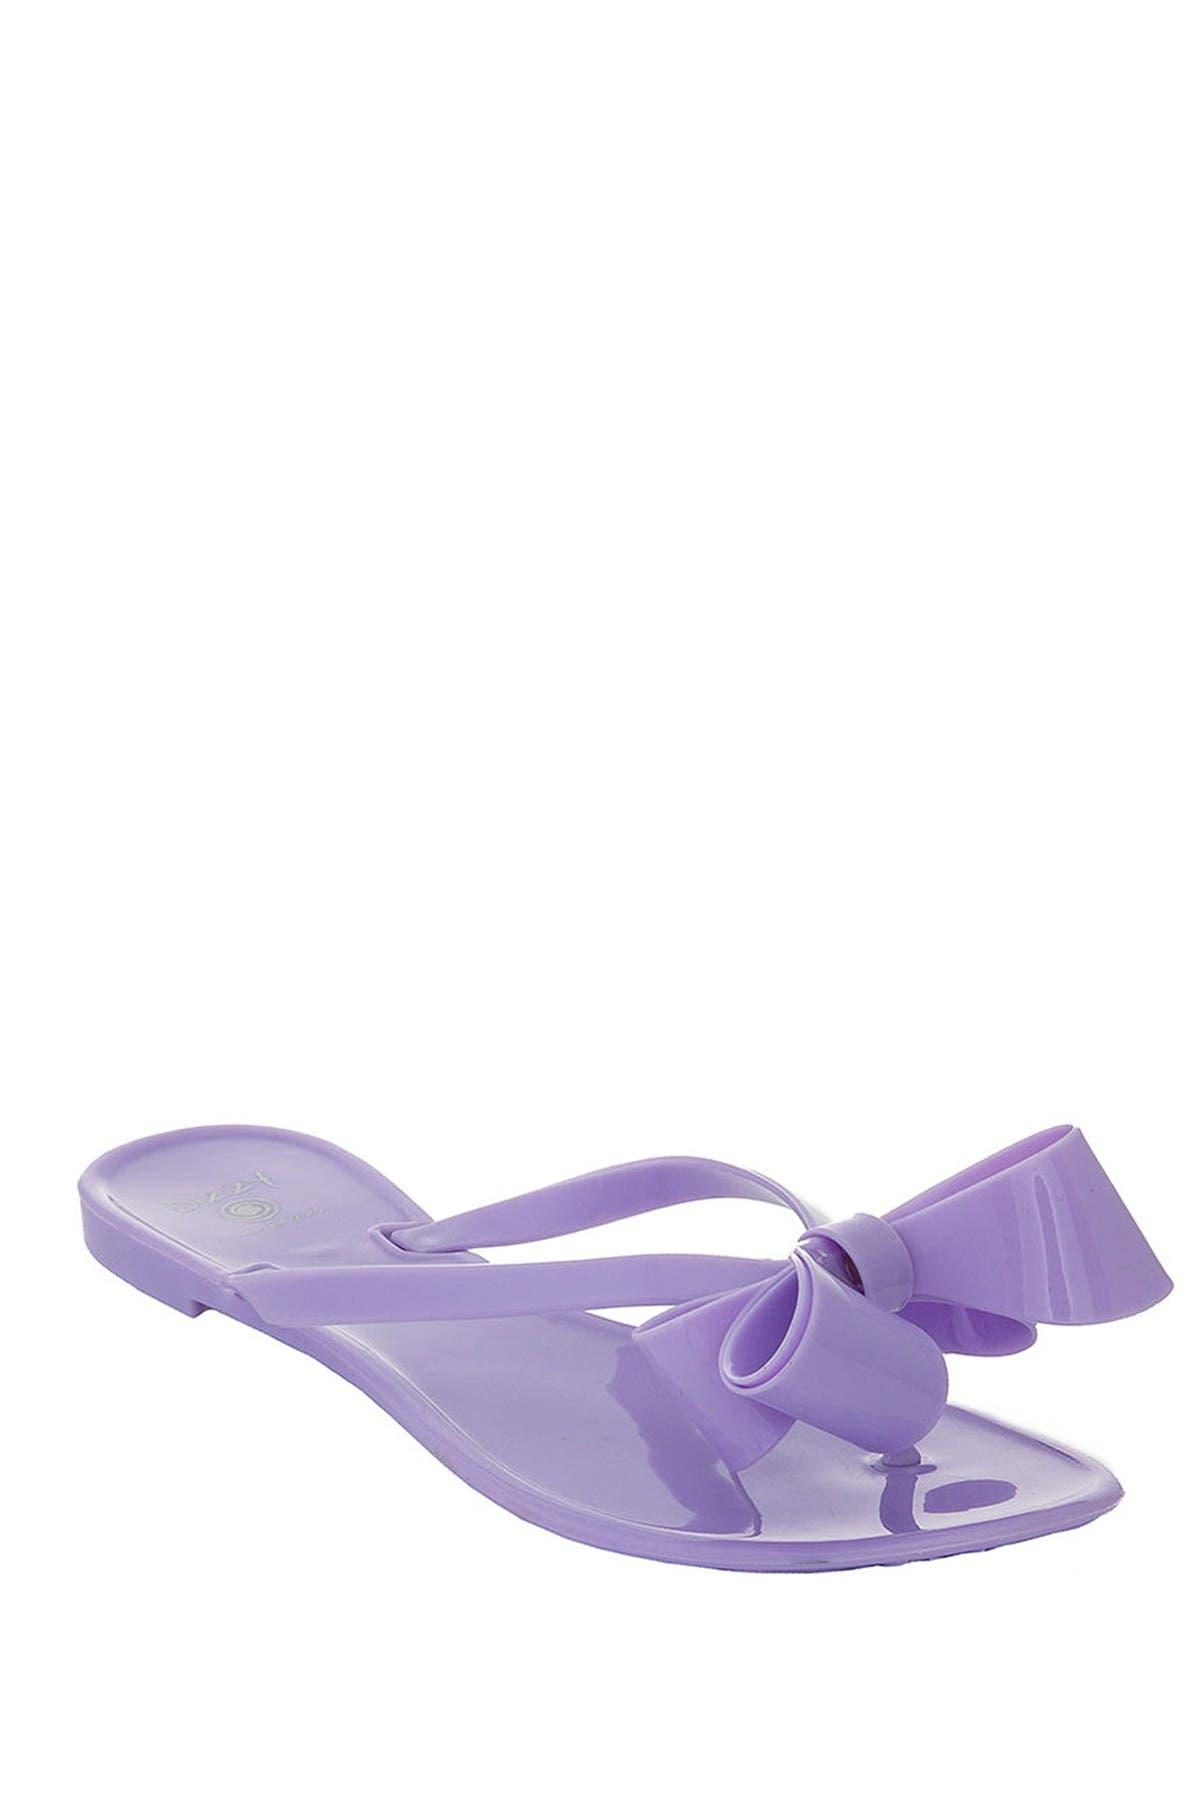 Image of Dizzy Lounge Bow Sandal